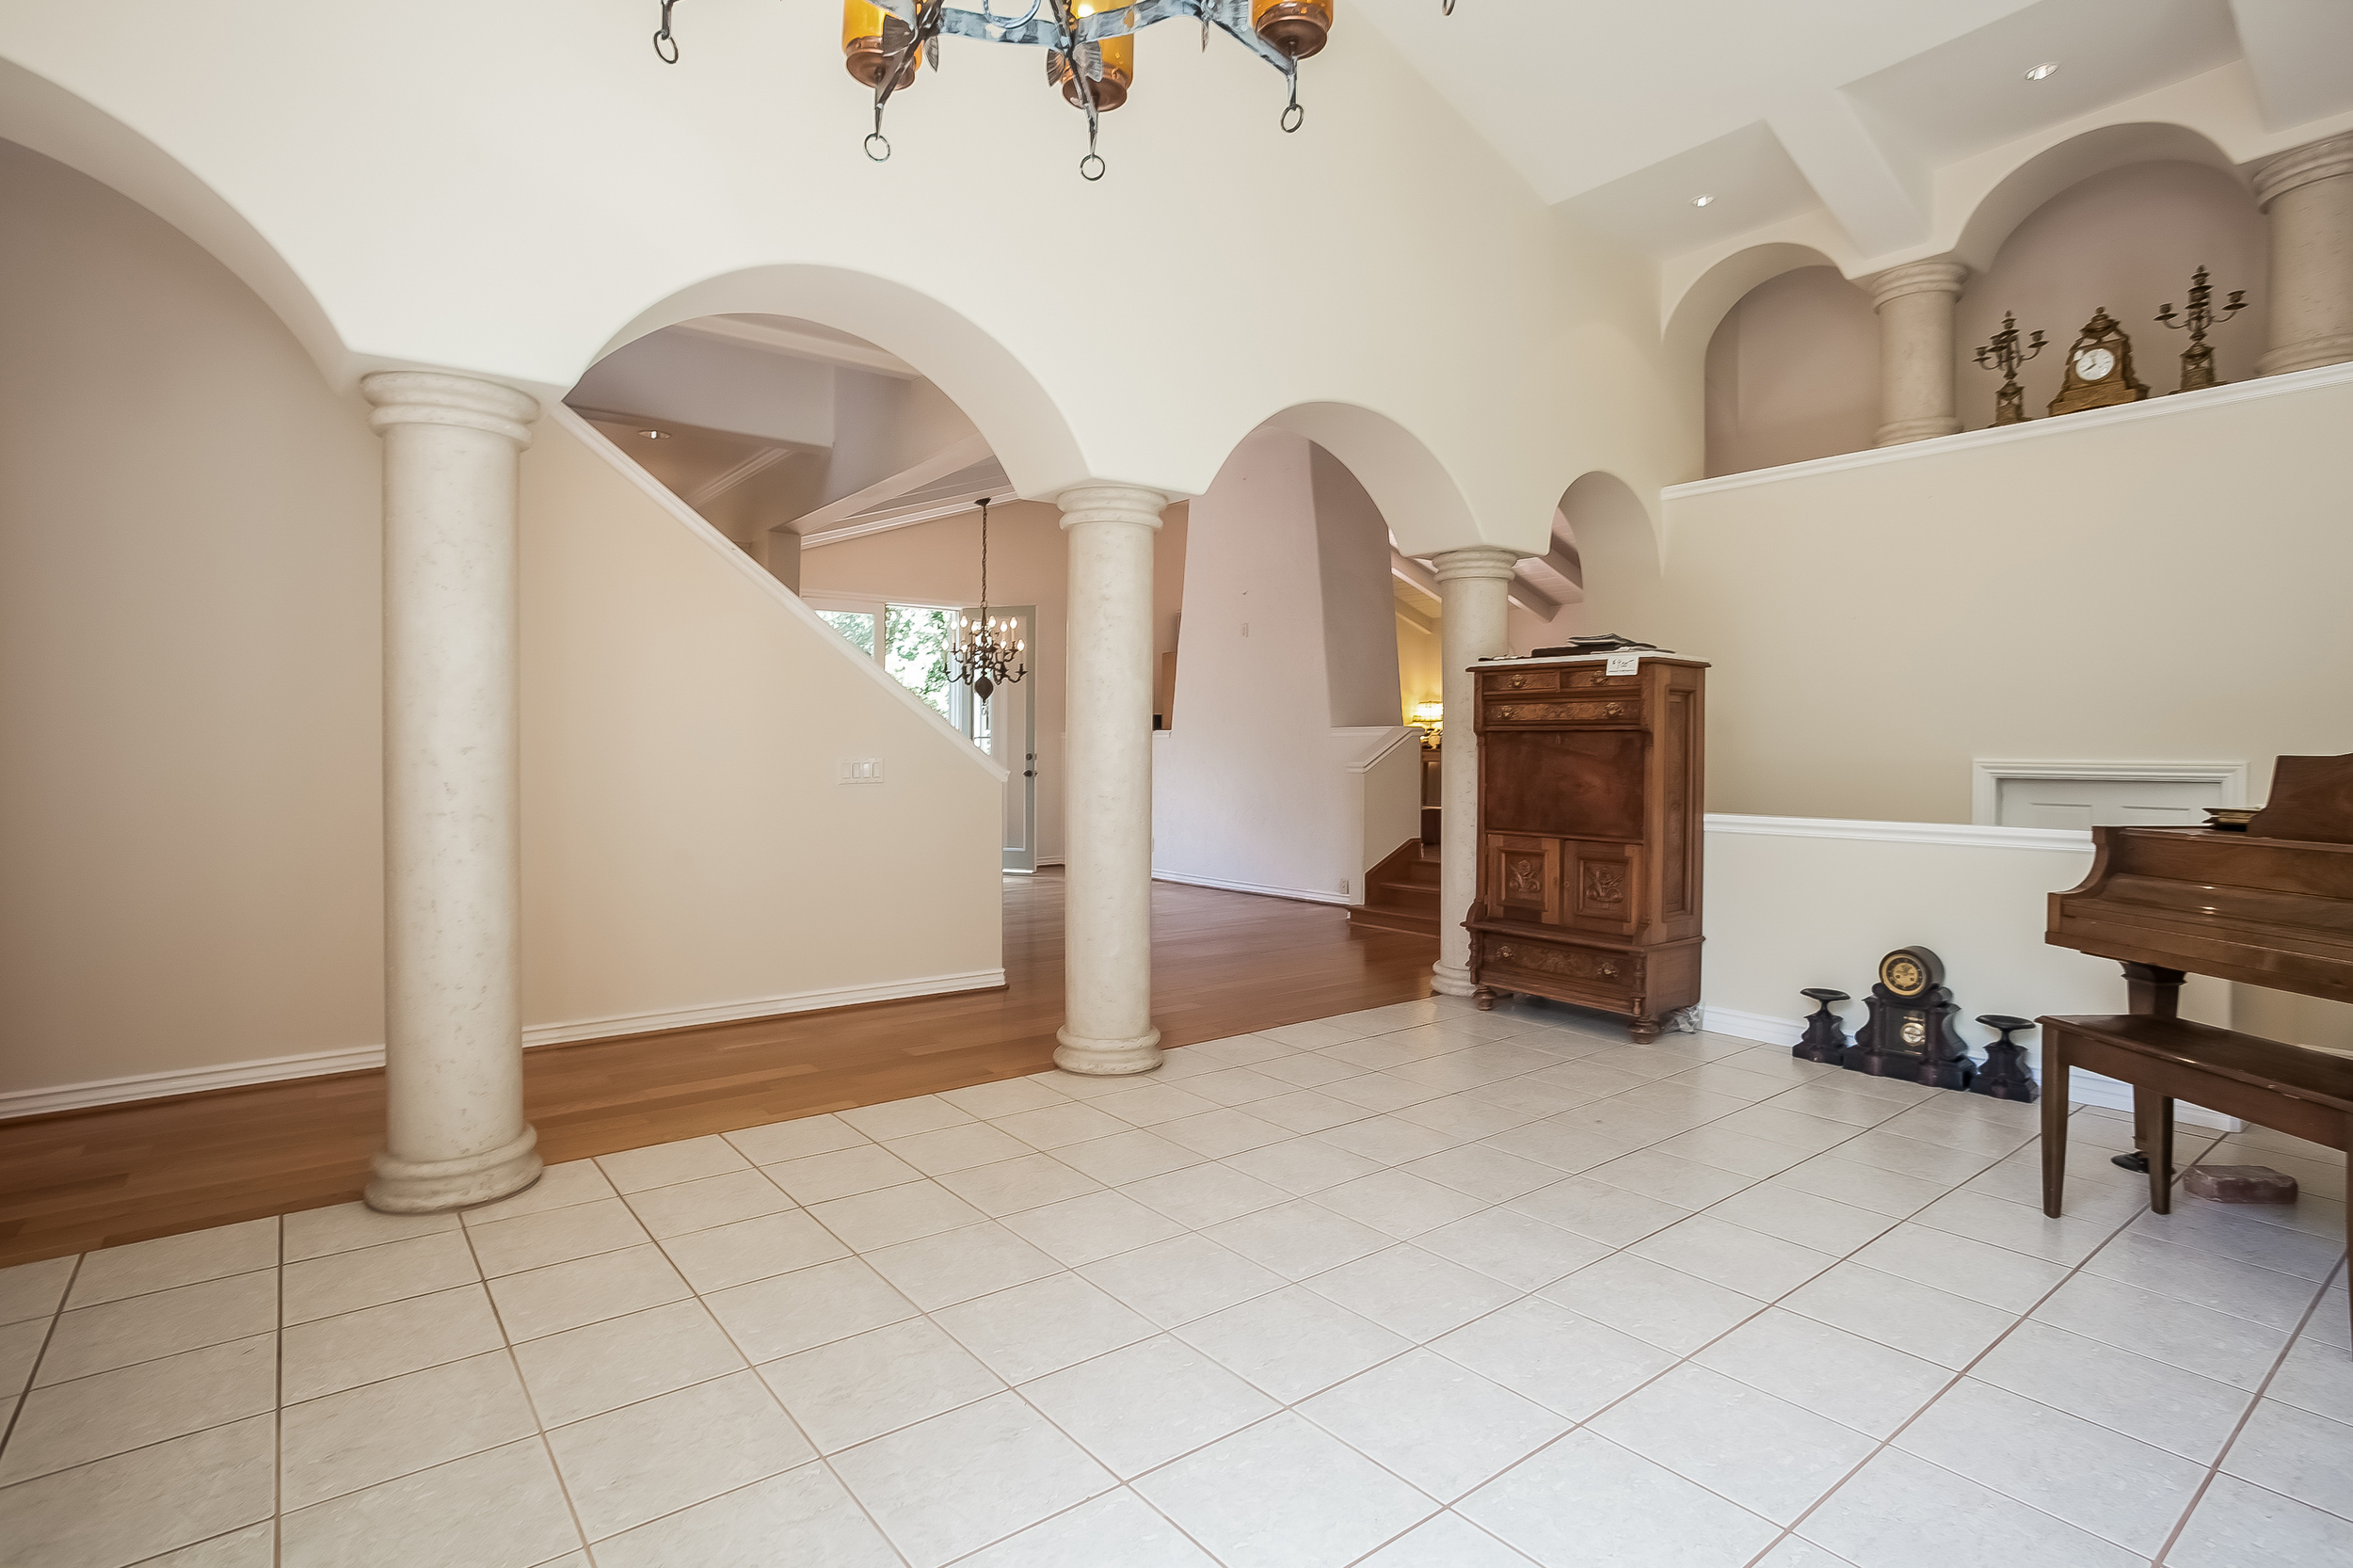 006-Foyer-2804361-large.jpg